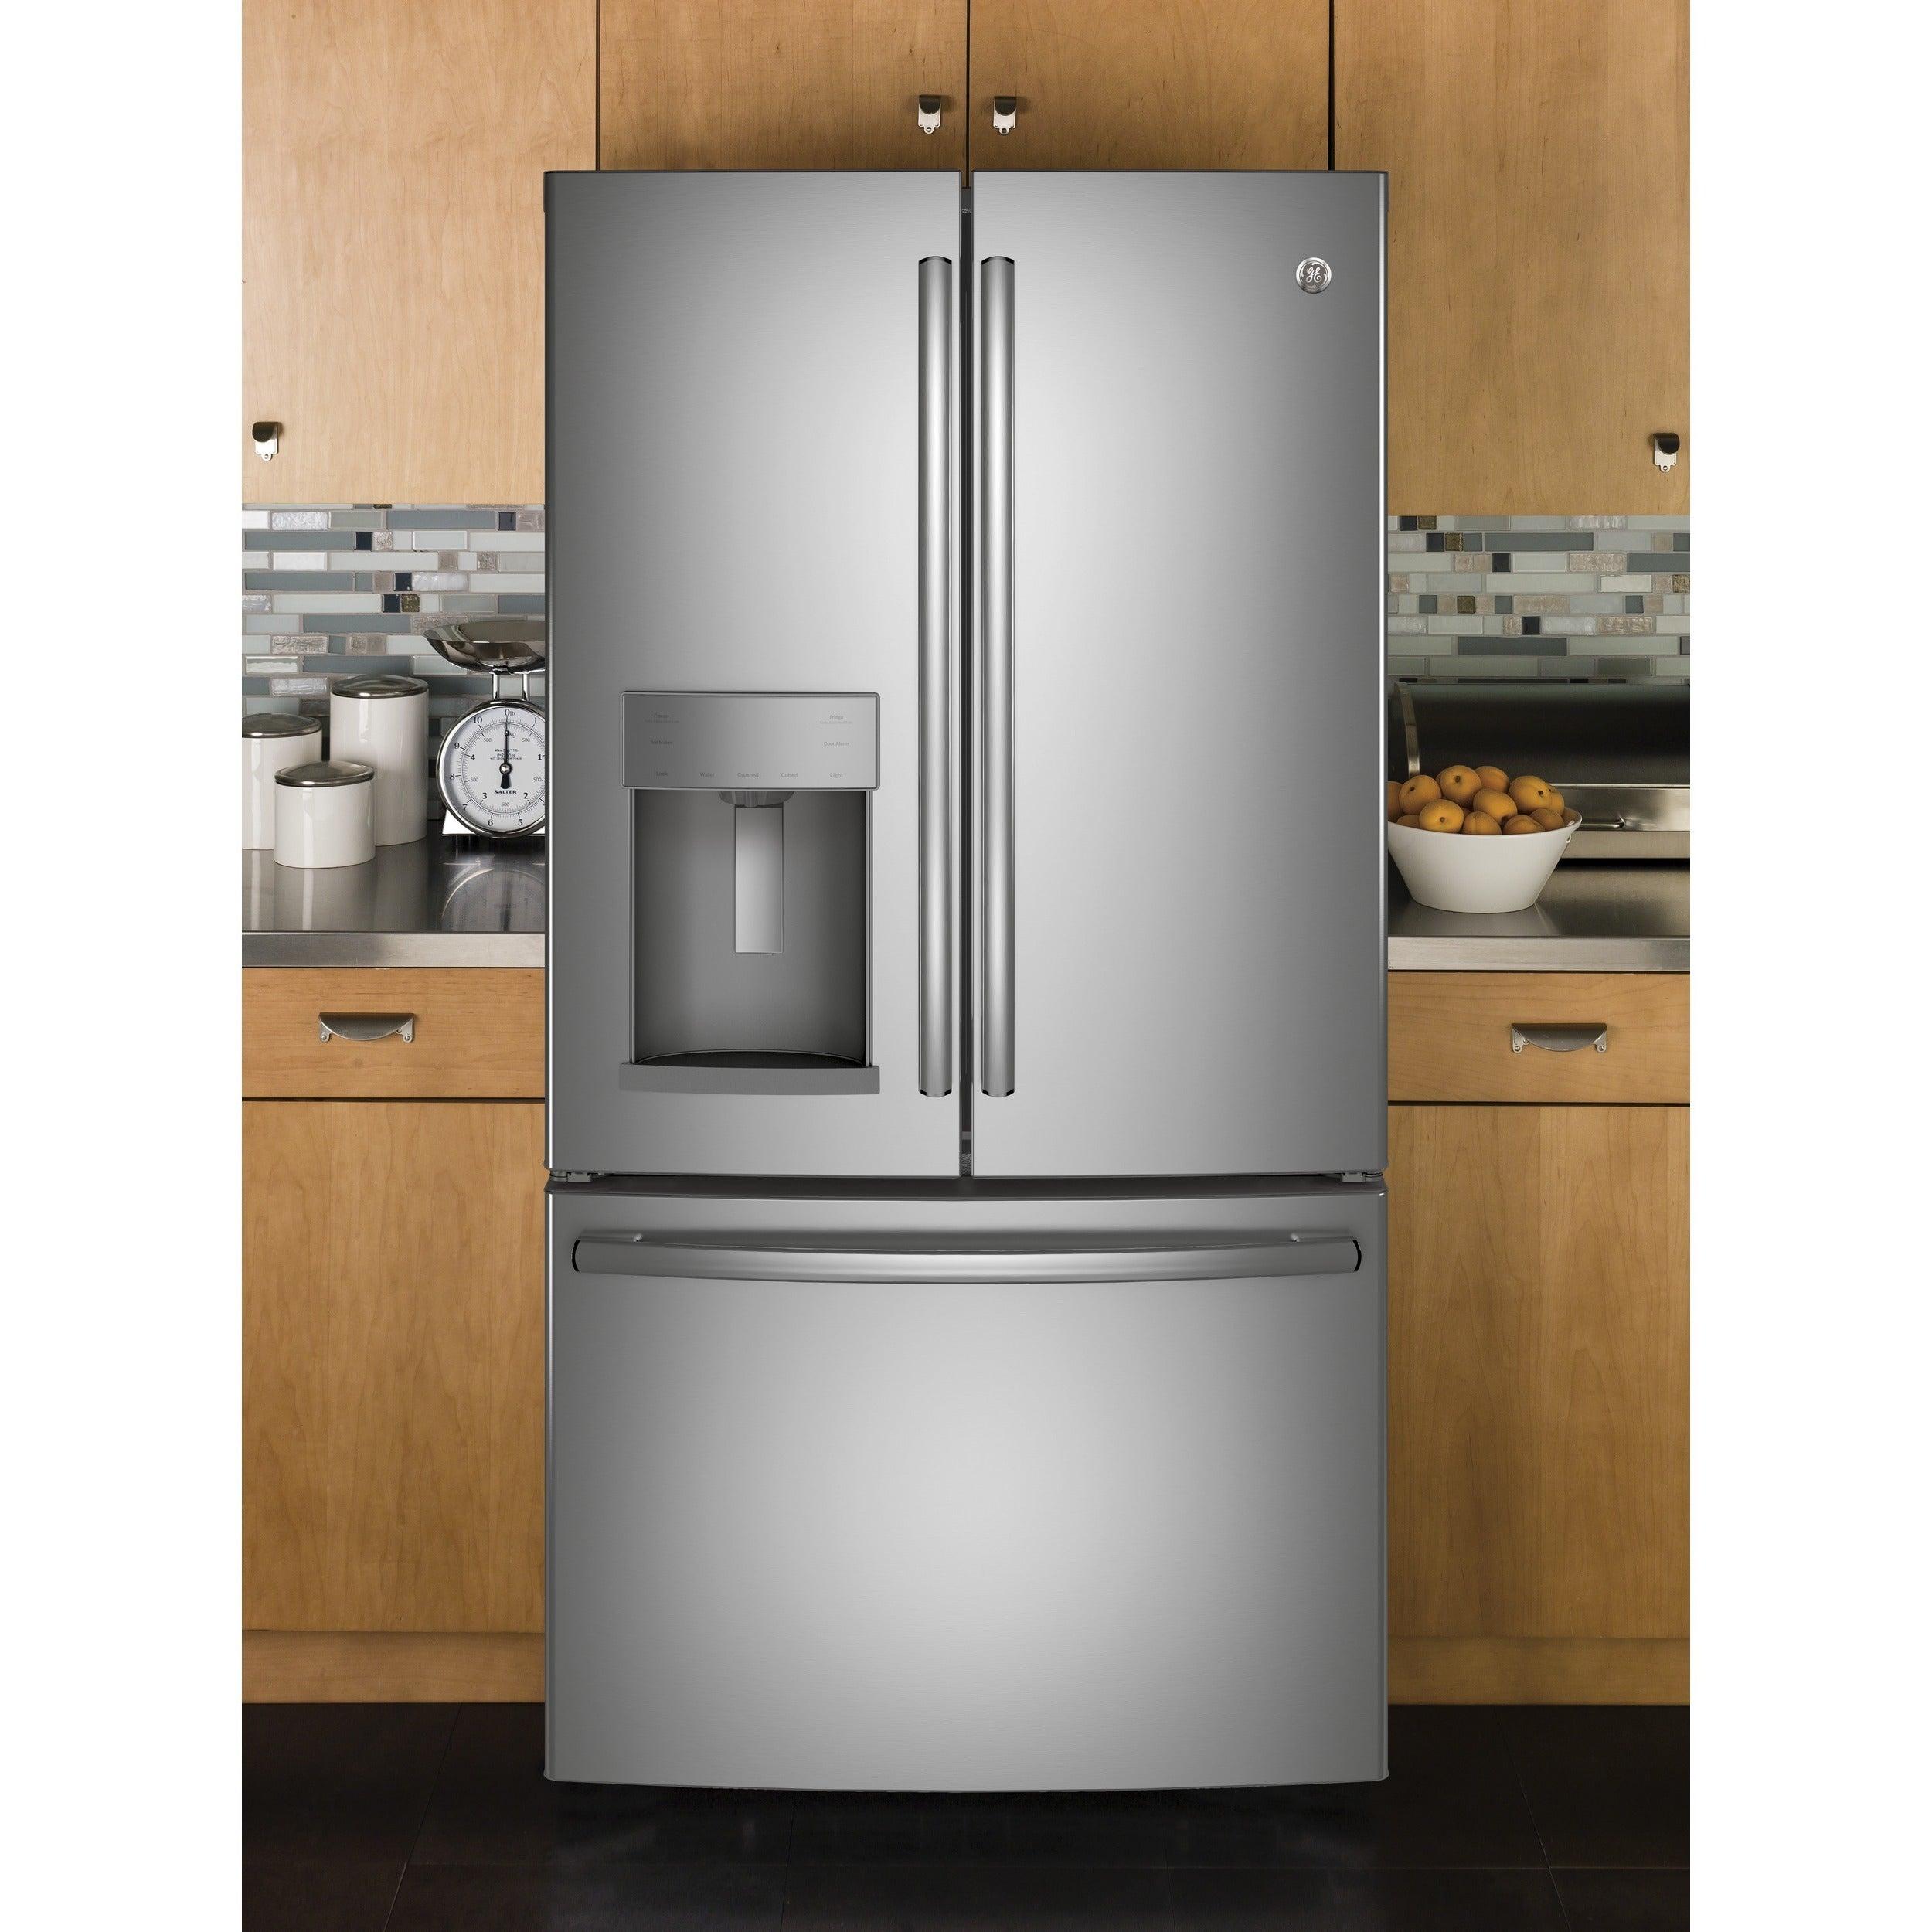 GE Appliances Energy Star 27.8 Cubic Foot French Door Ref...